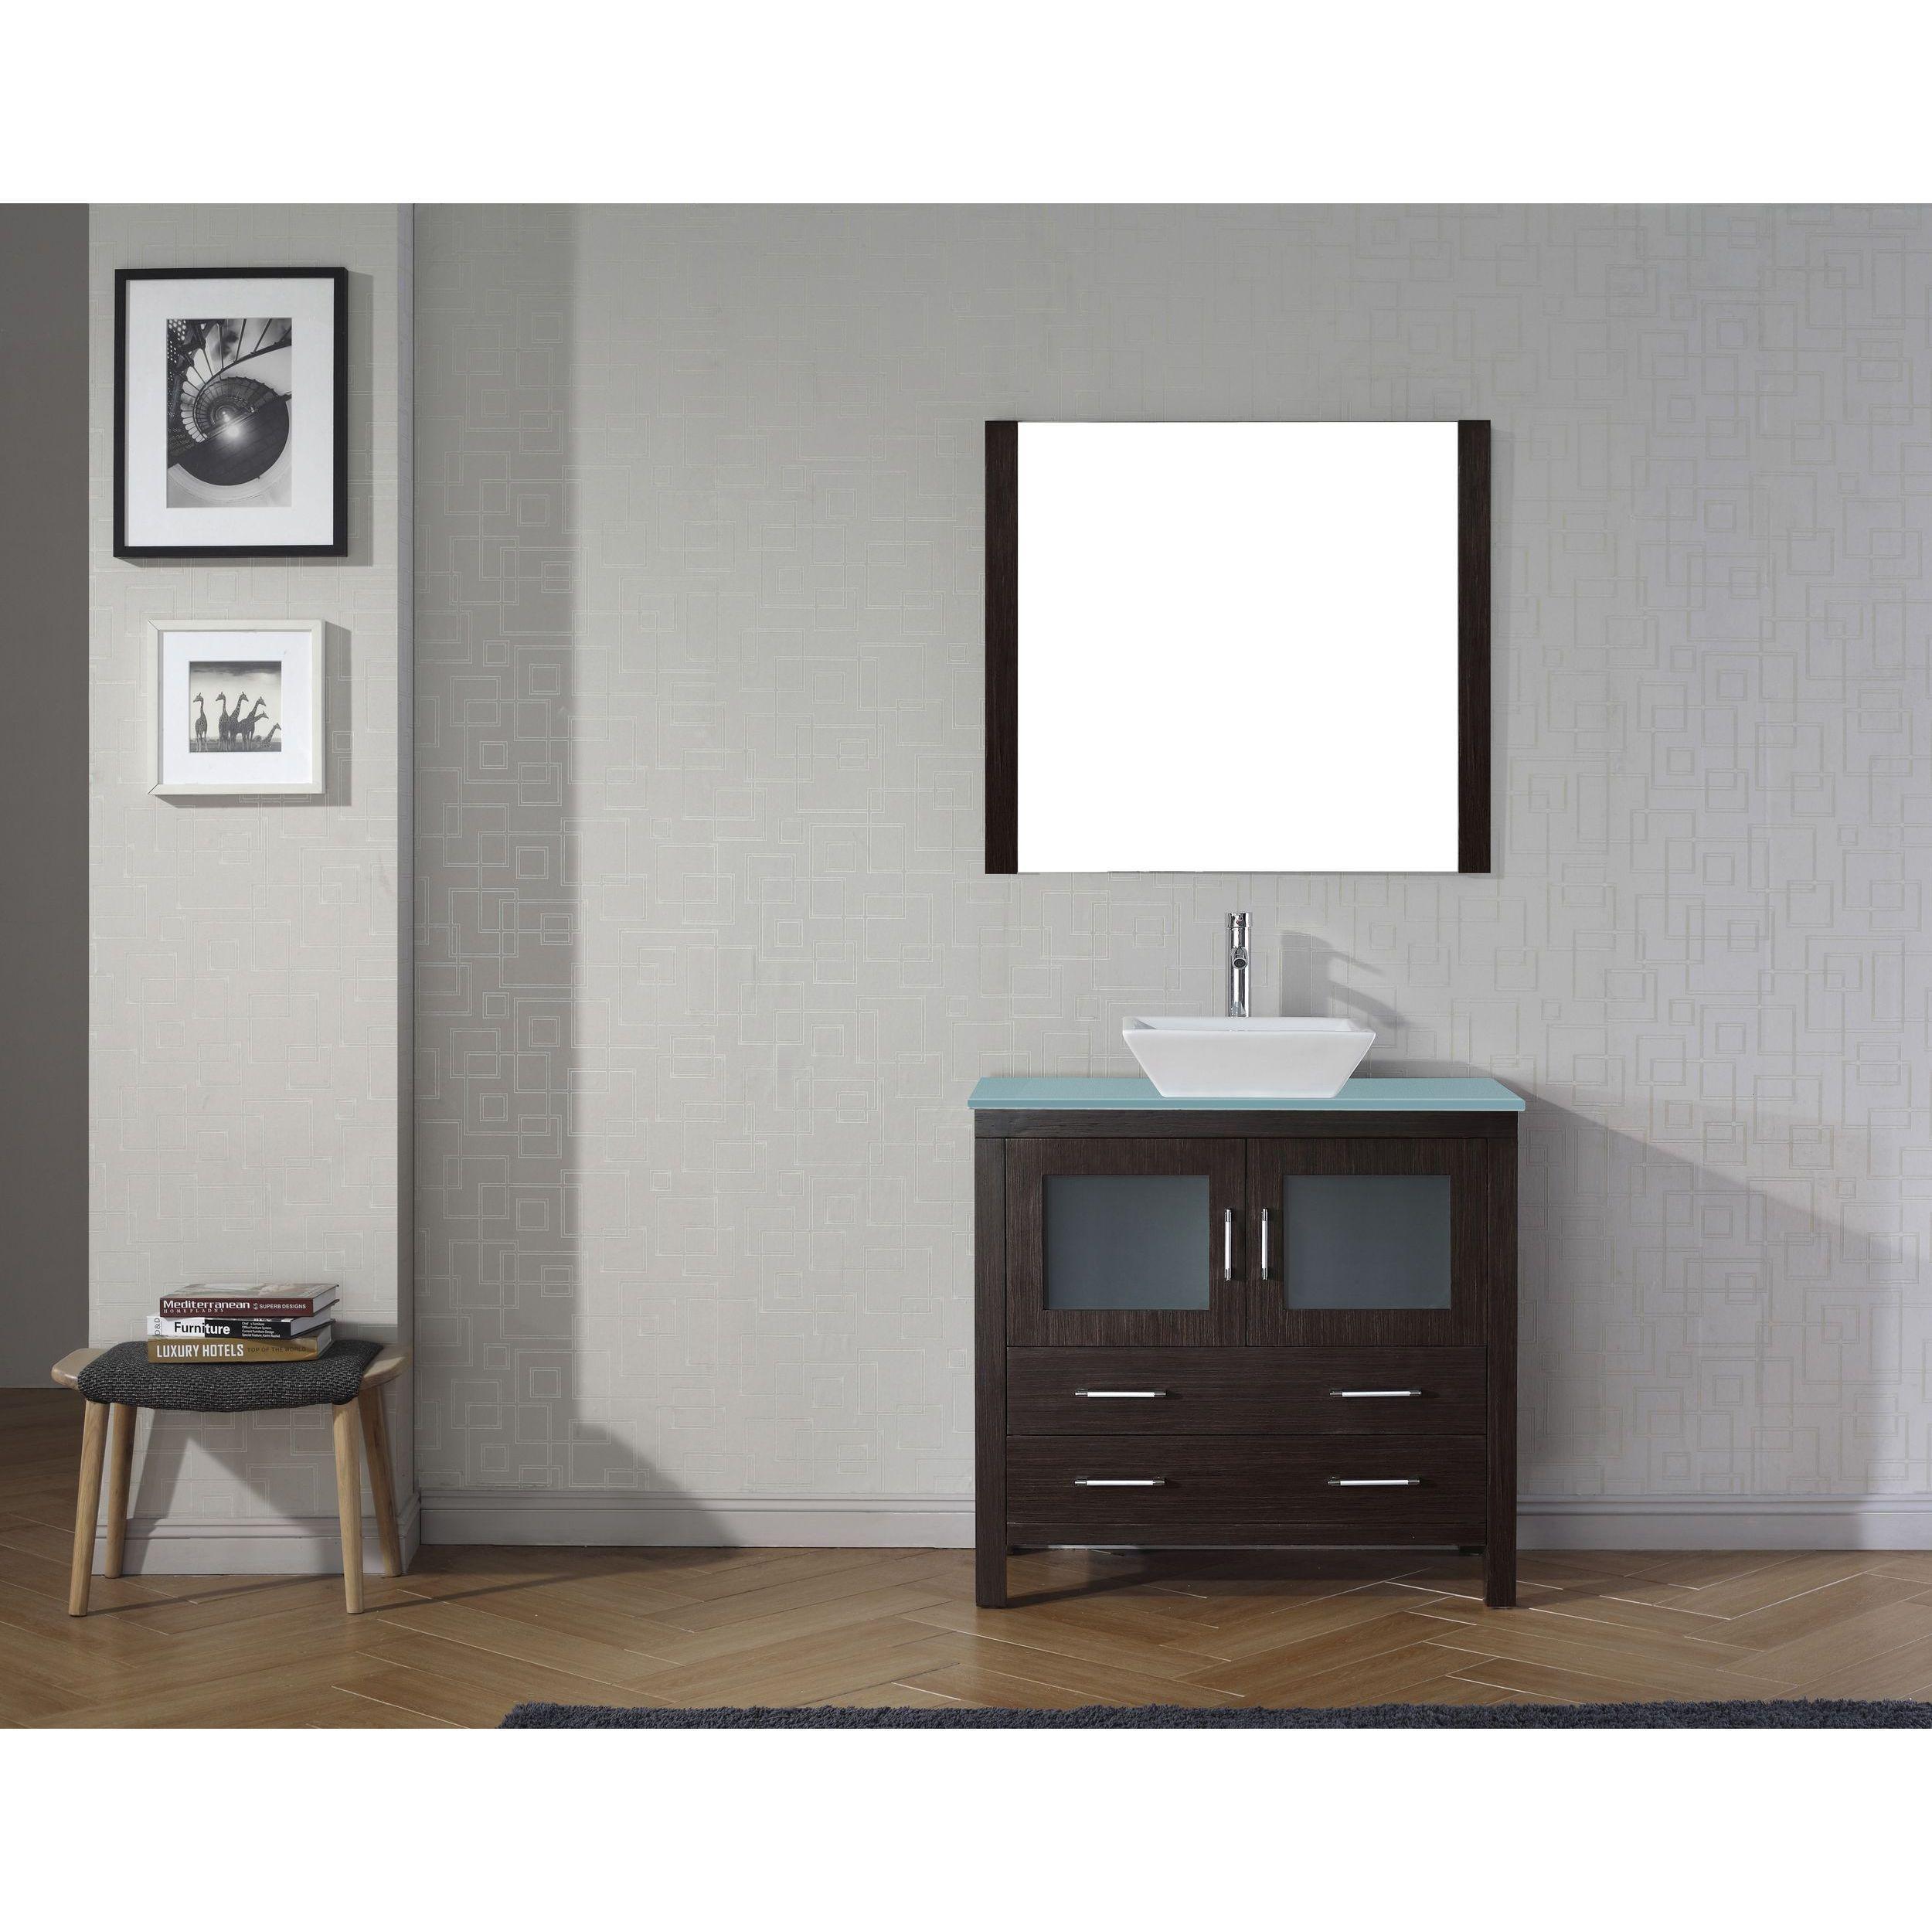 Virtu USA Dior inch Glass Top Double Bathroom Vanity Set with